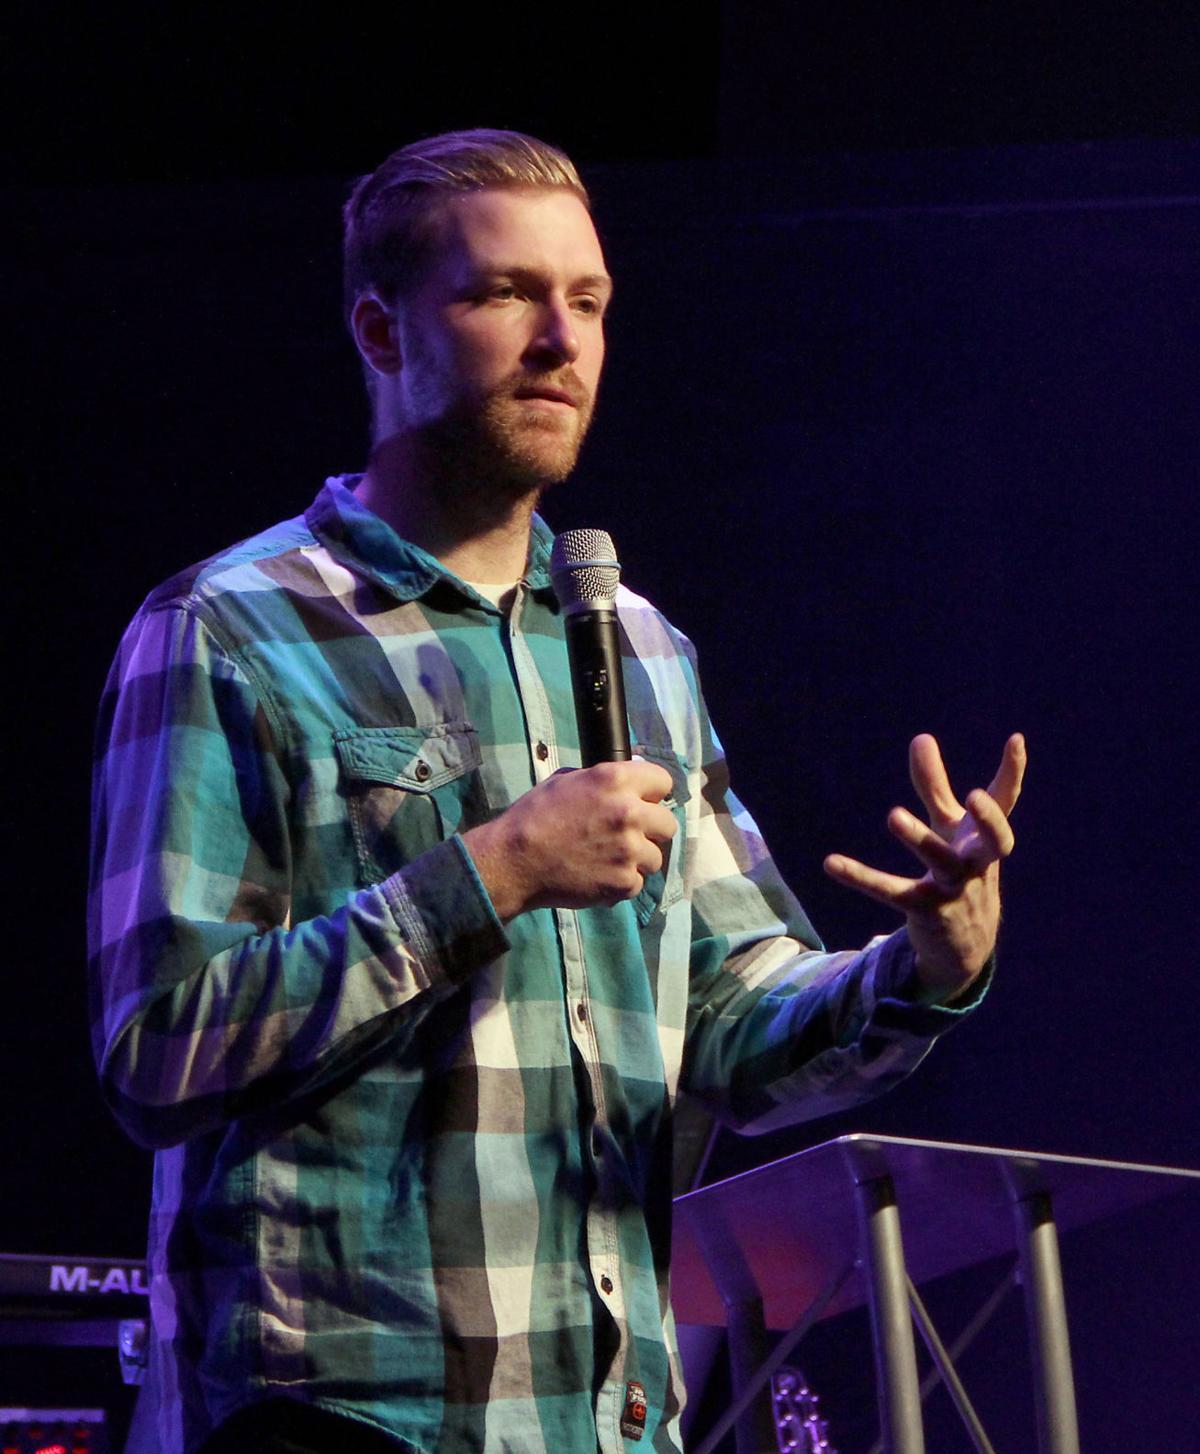 Reedsburg preacher